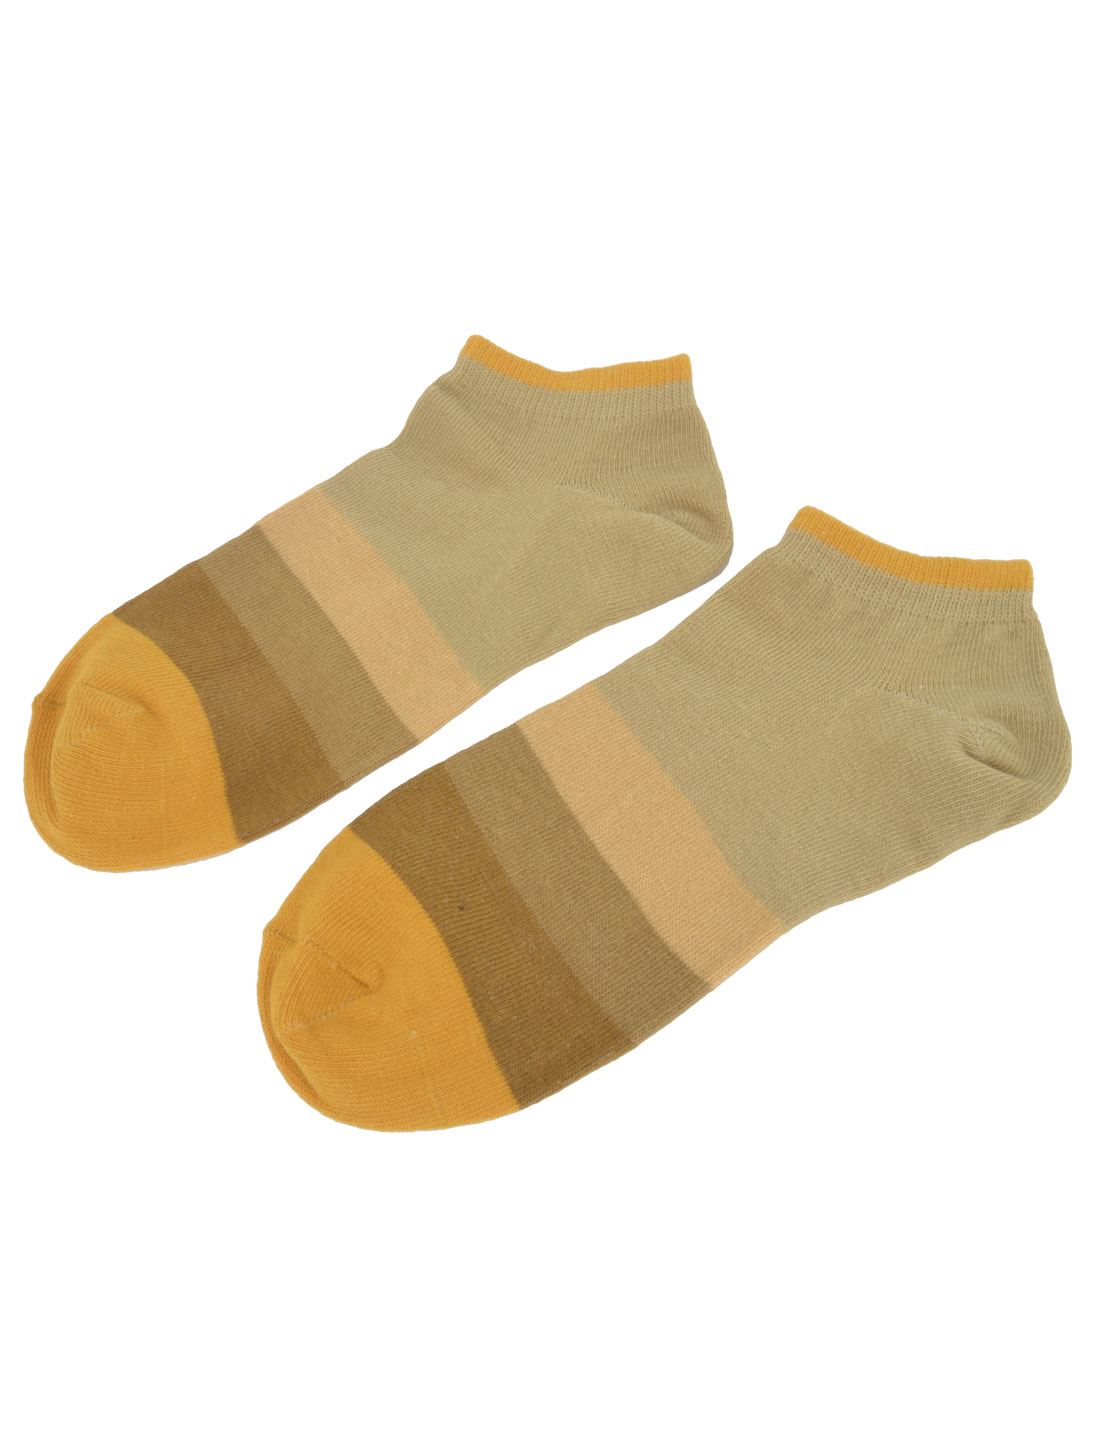 Men Women Ankle No Show Soft Casual Short Hosiery Socks Orange Khaki Pair